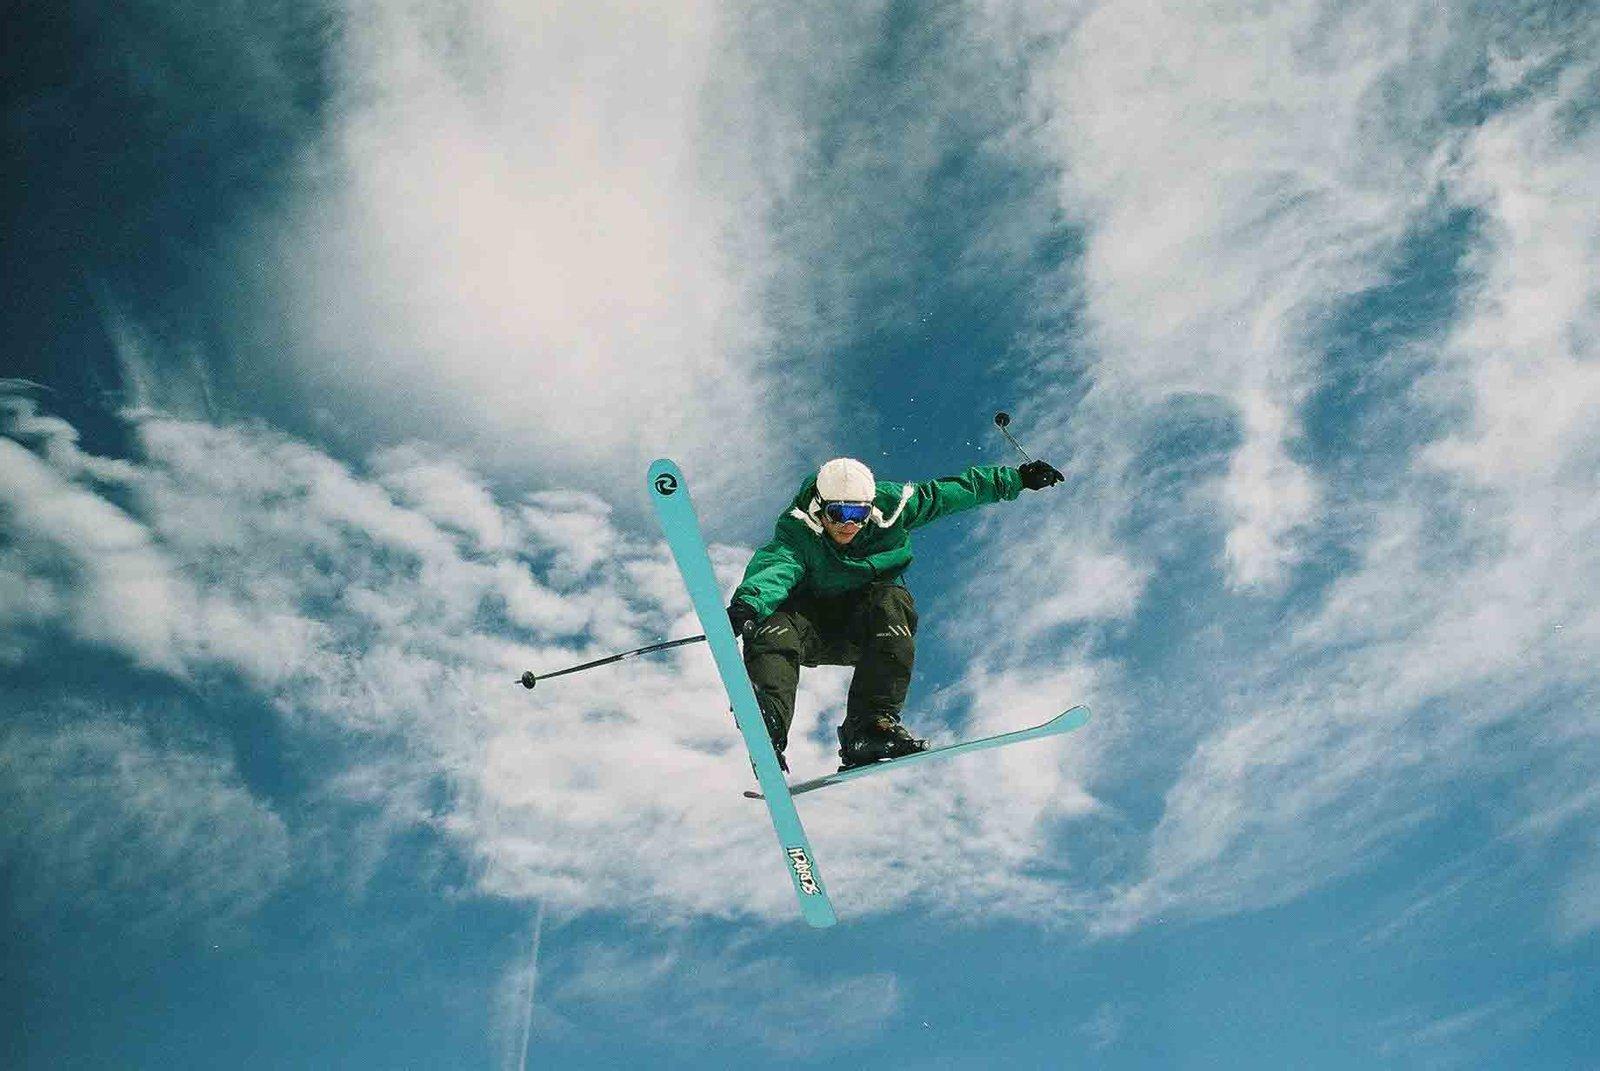 Jump to heaven